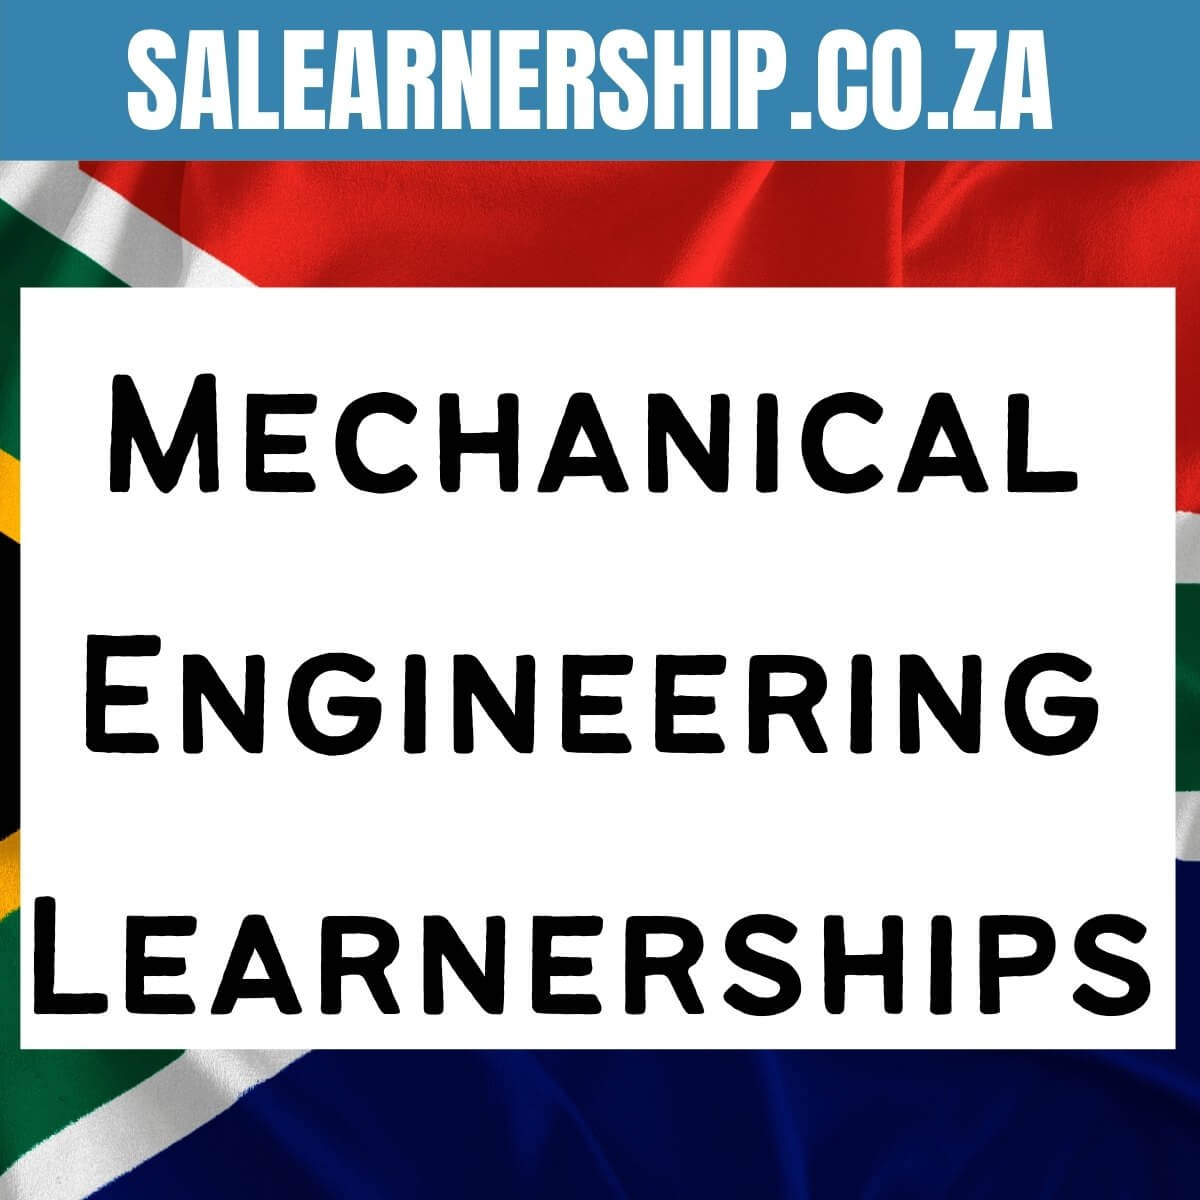 mechanical engineering learnerships